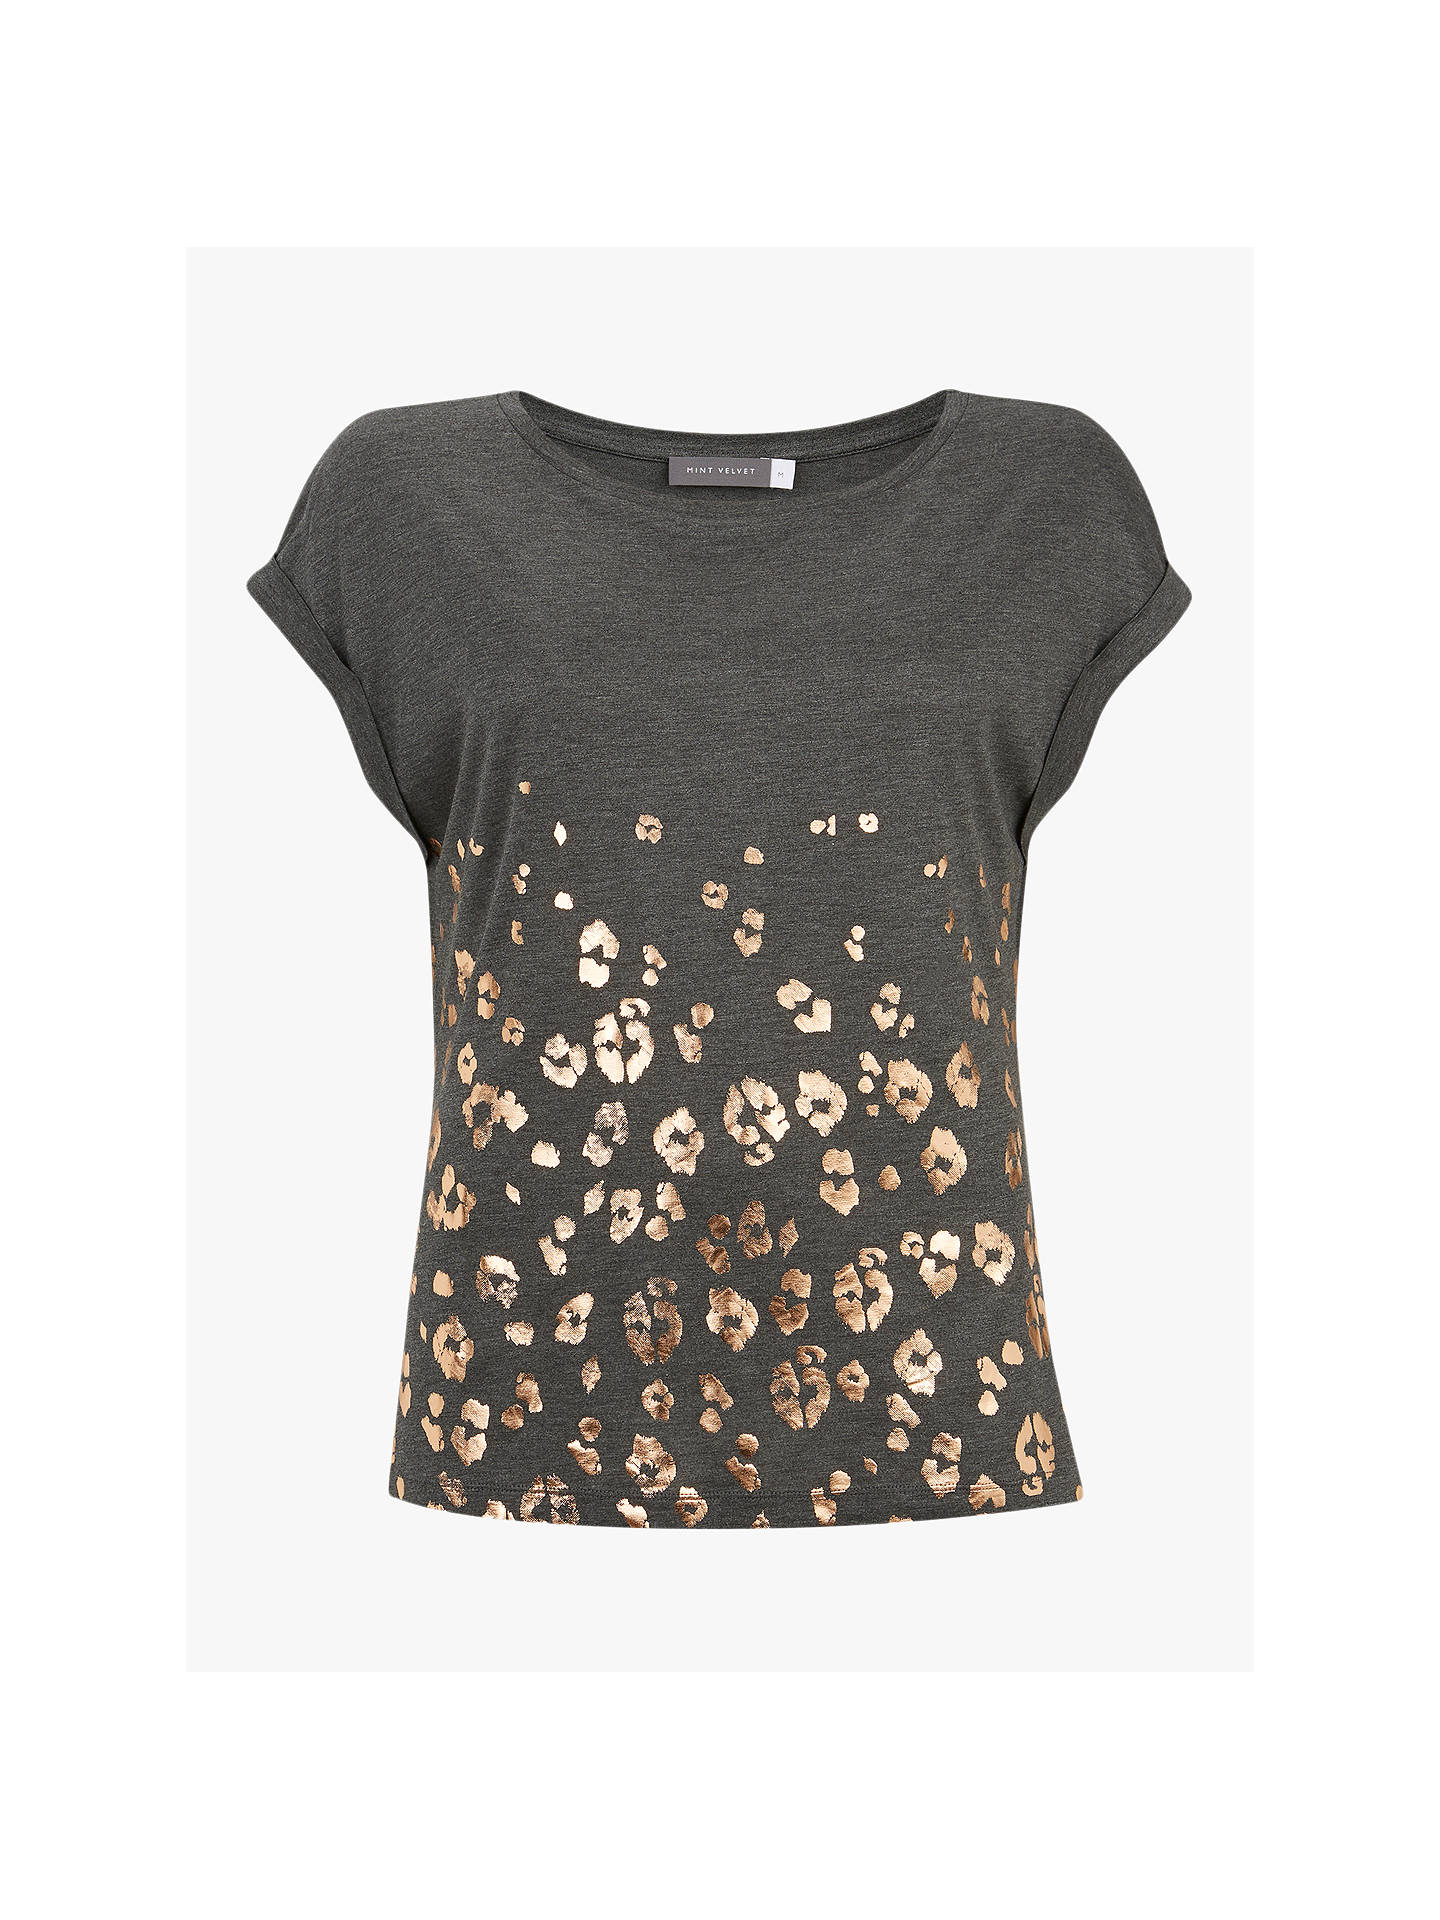 88e5dec9adb1 Buy Mint Velvet Leopard Print T-Shirt, Grey, L Online at johnlewis.